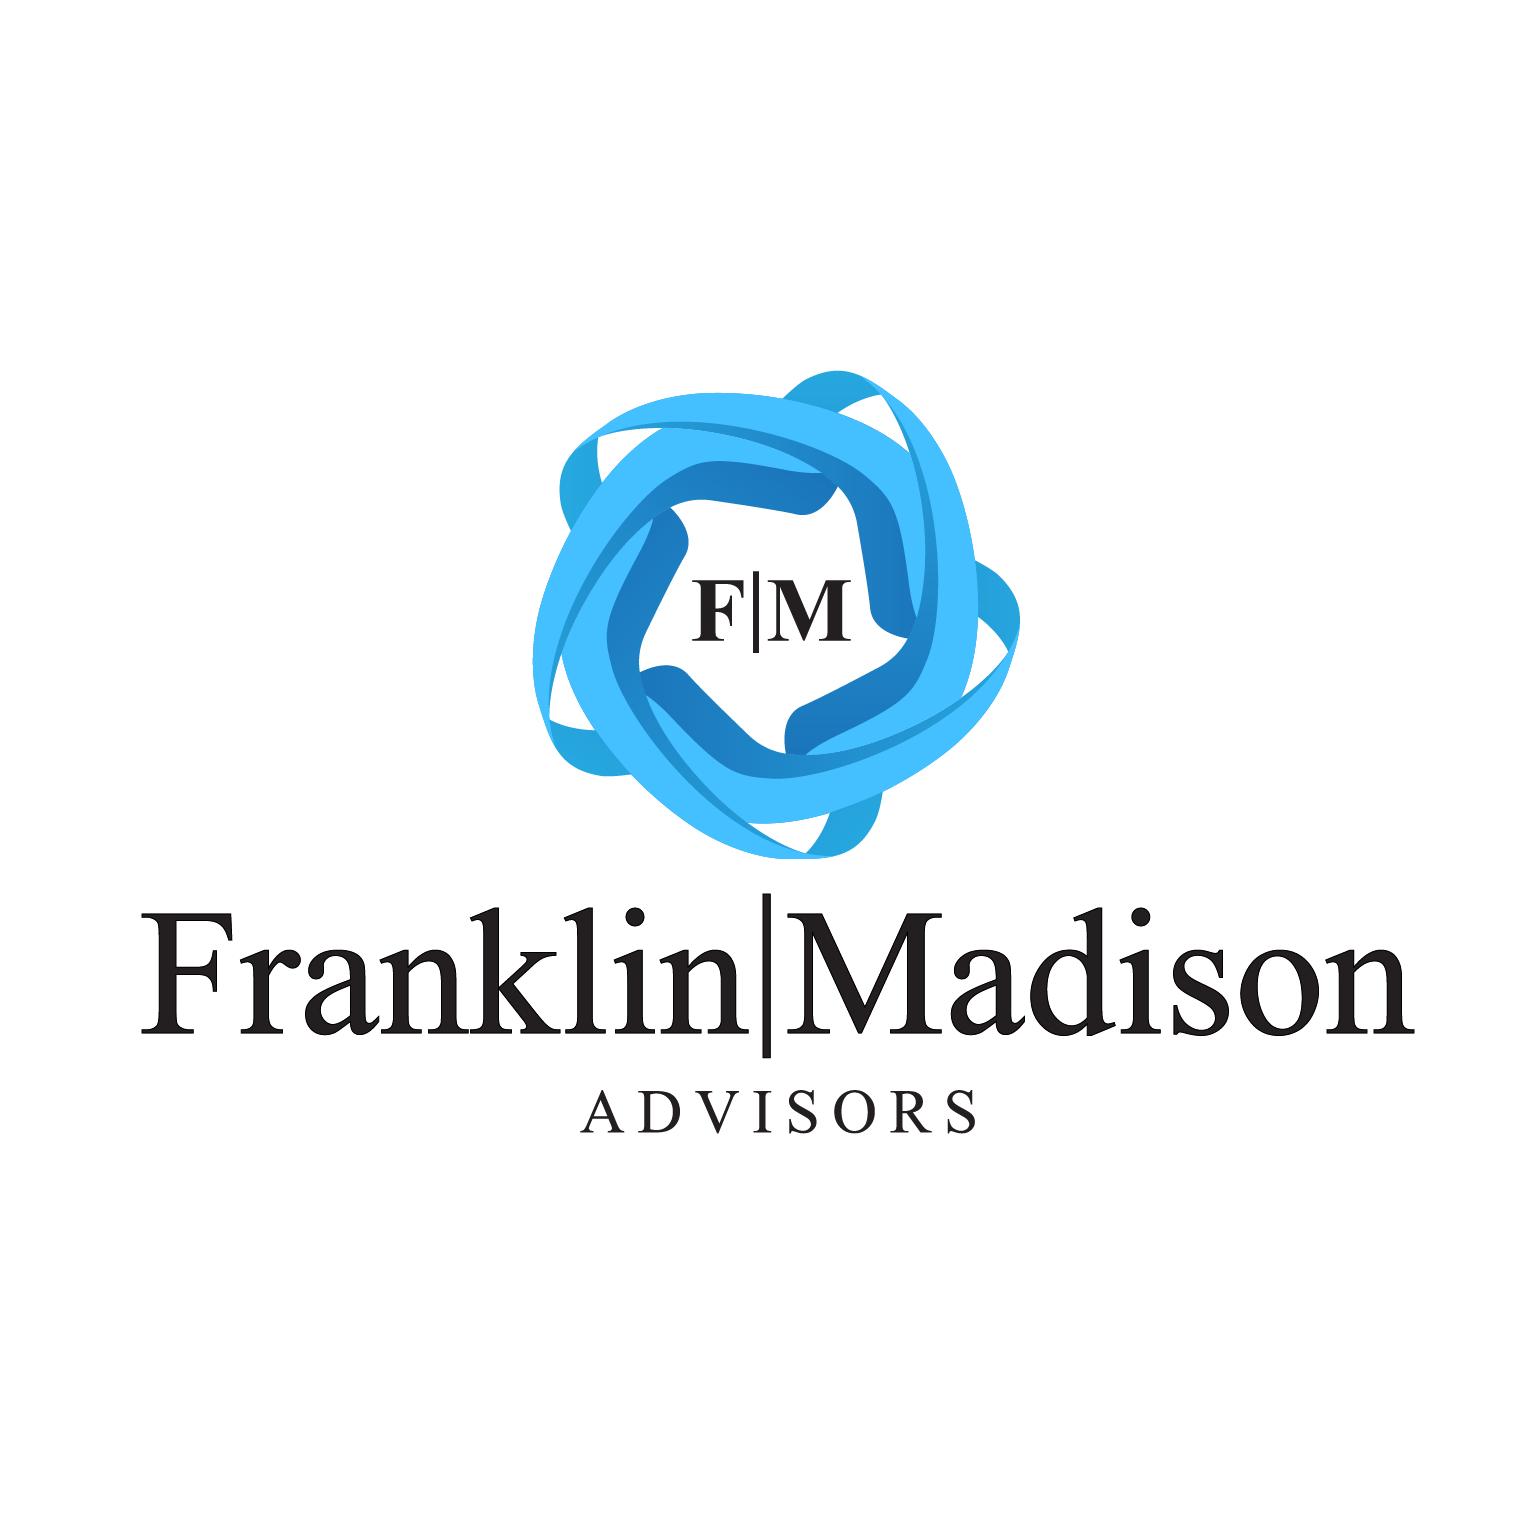 Franklin Madison Advisors